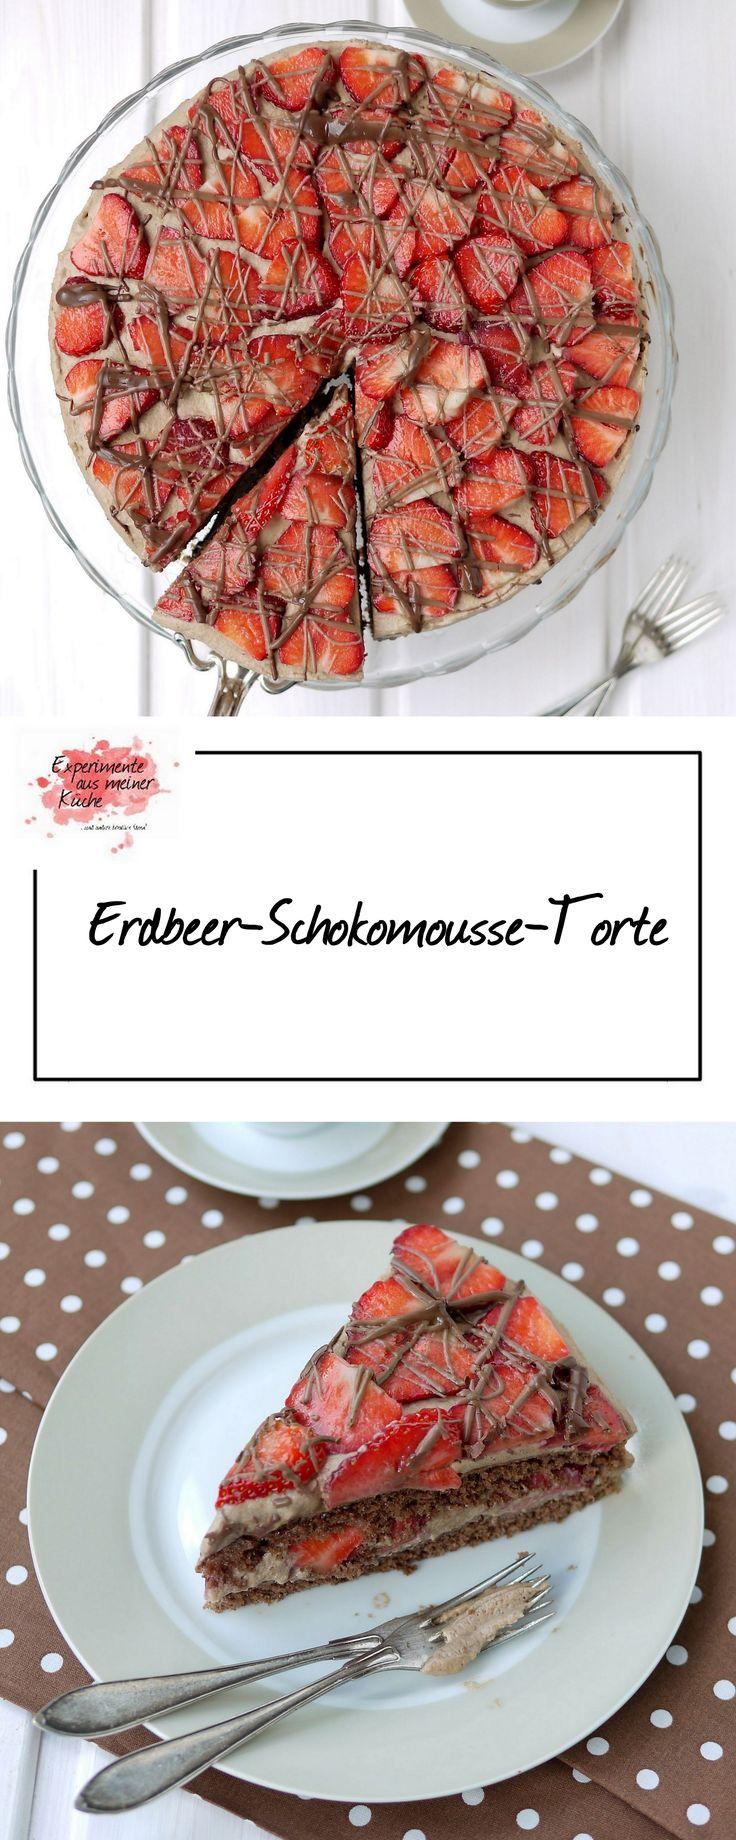 Erdbeer-Schokomousse-Torte | Rezept | Backen | Kuchen